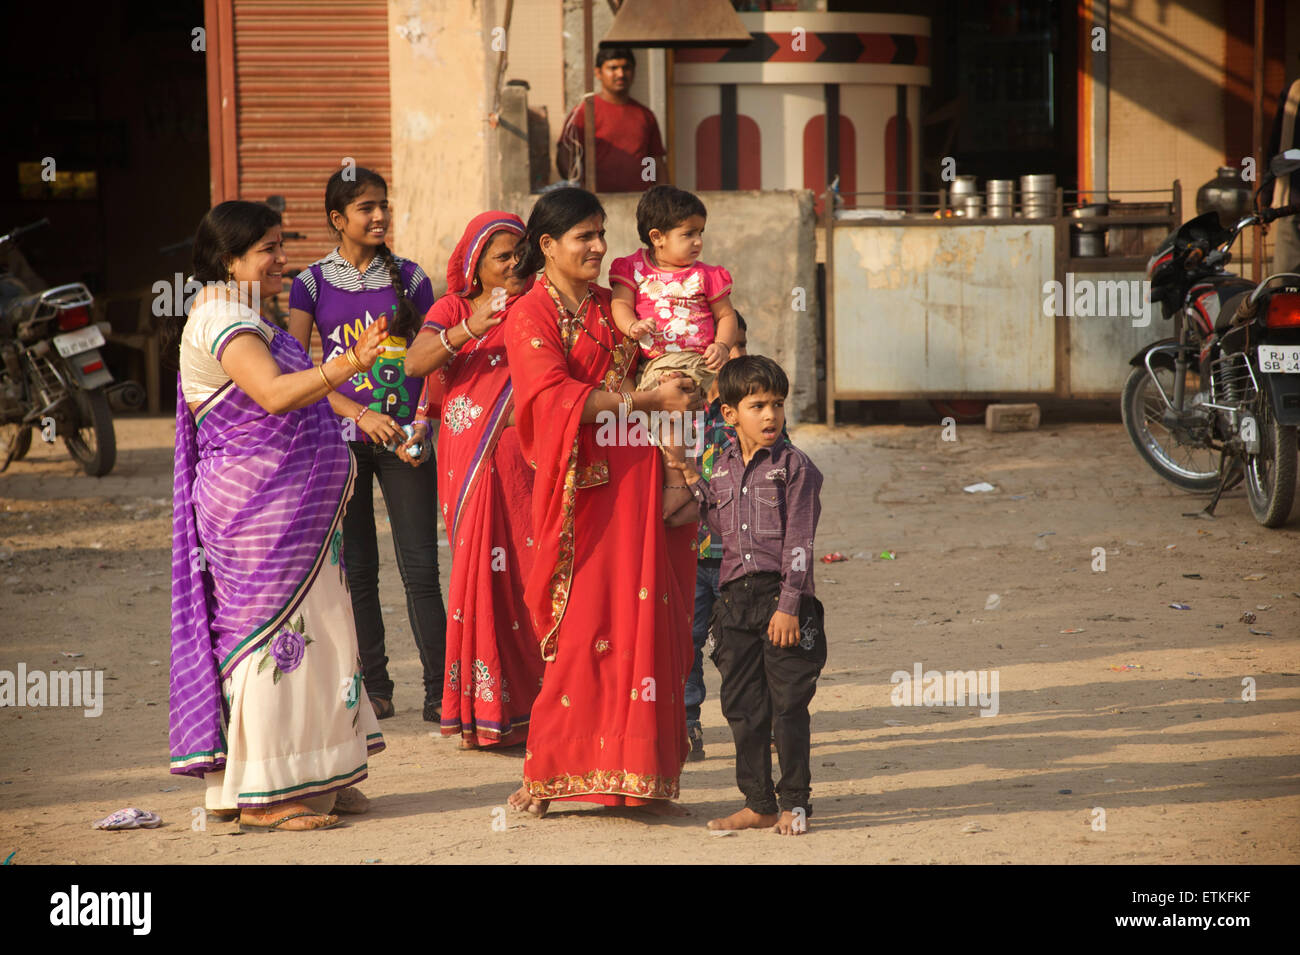 Famiglia indiana attraversando la strada, Jaipur, Rajasthan, India Immagini Stock